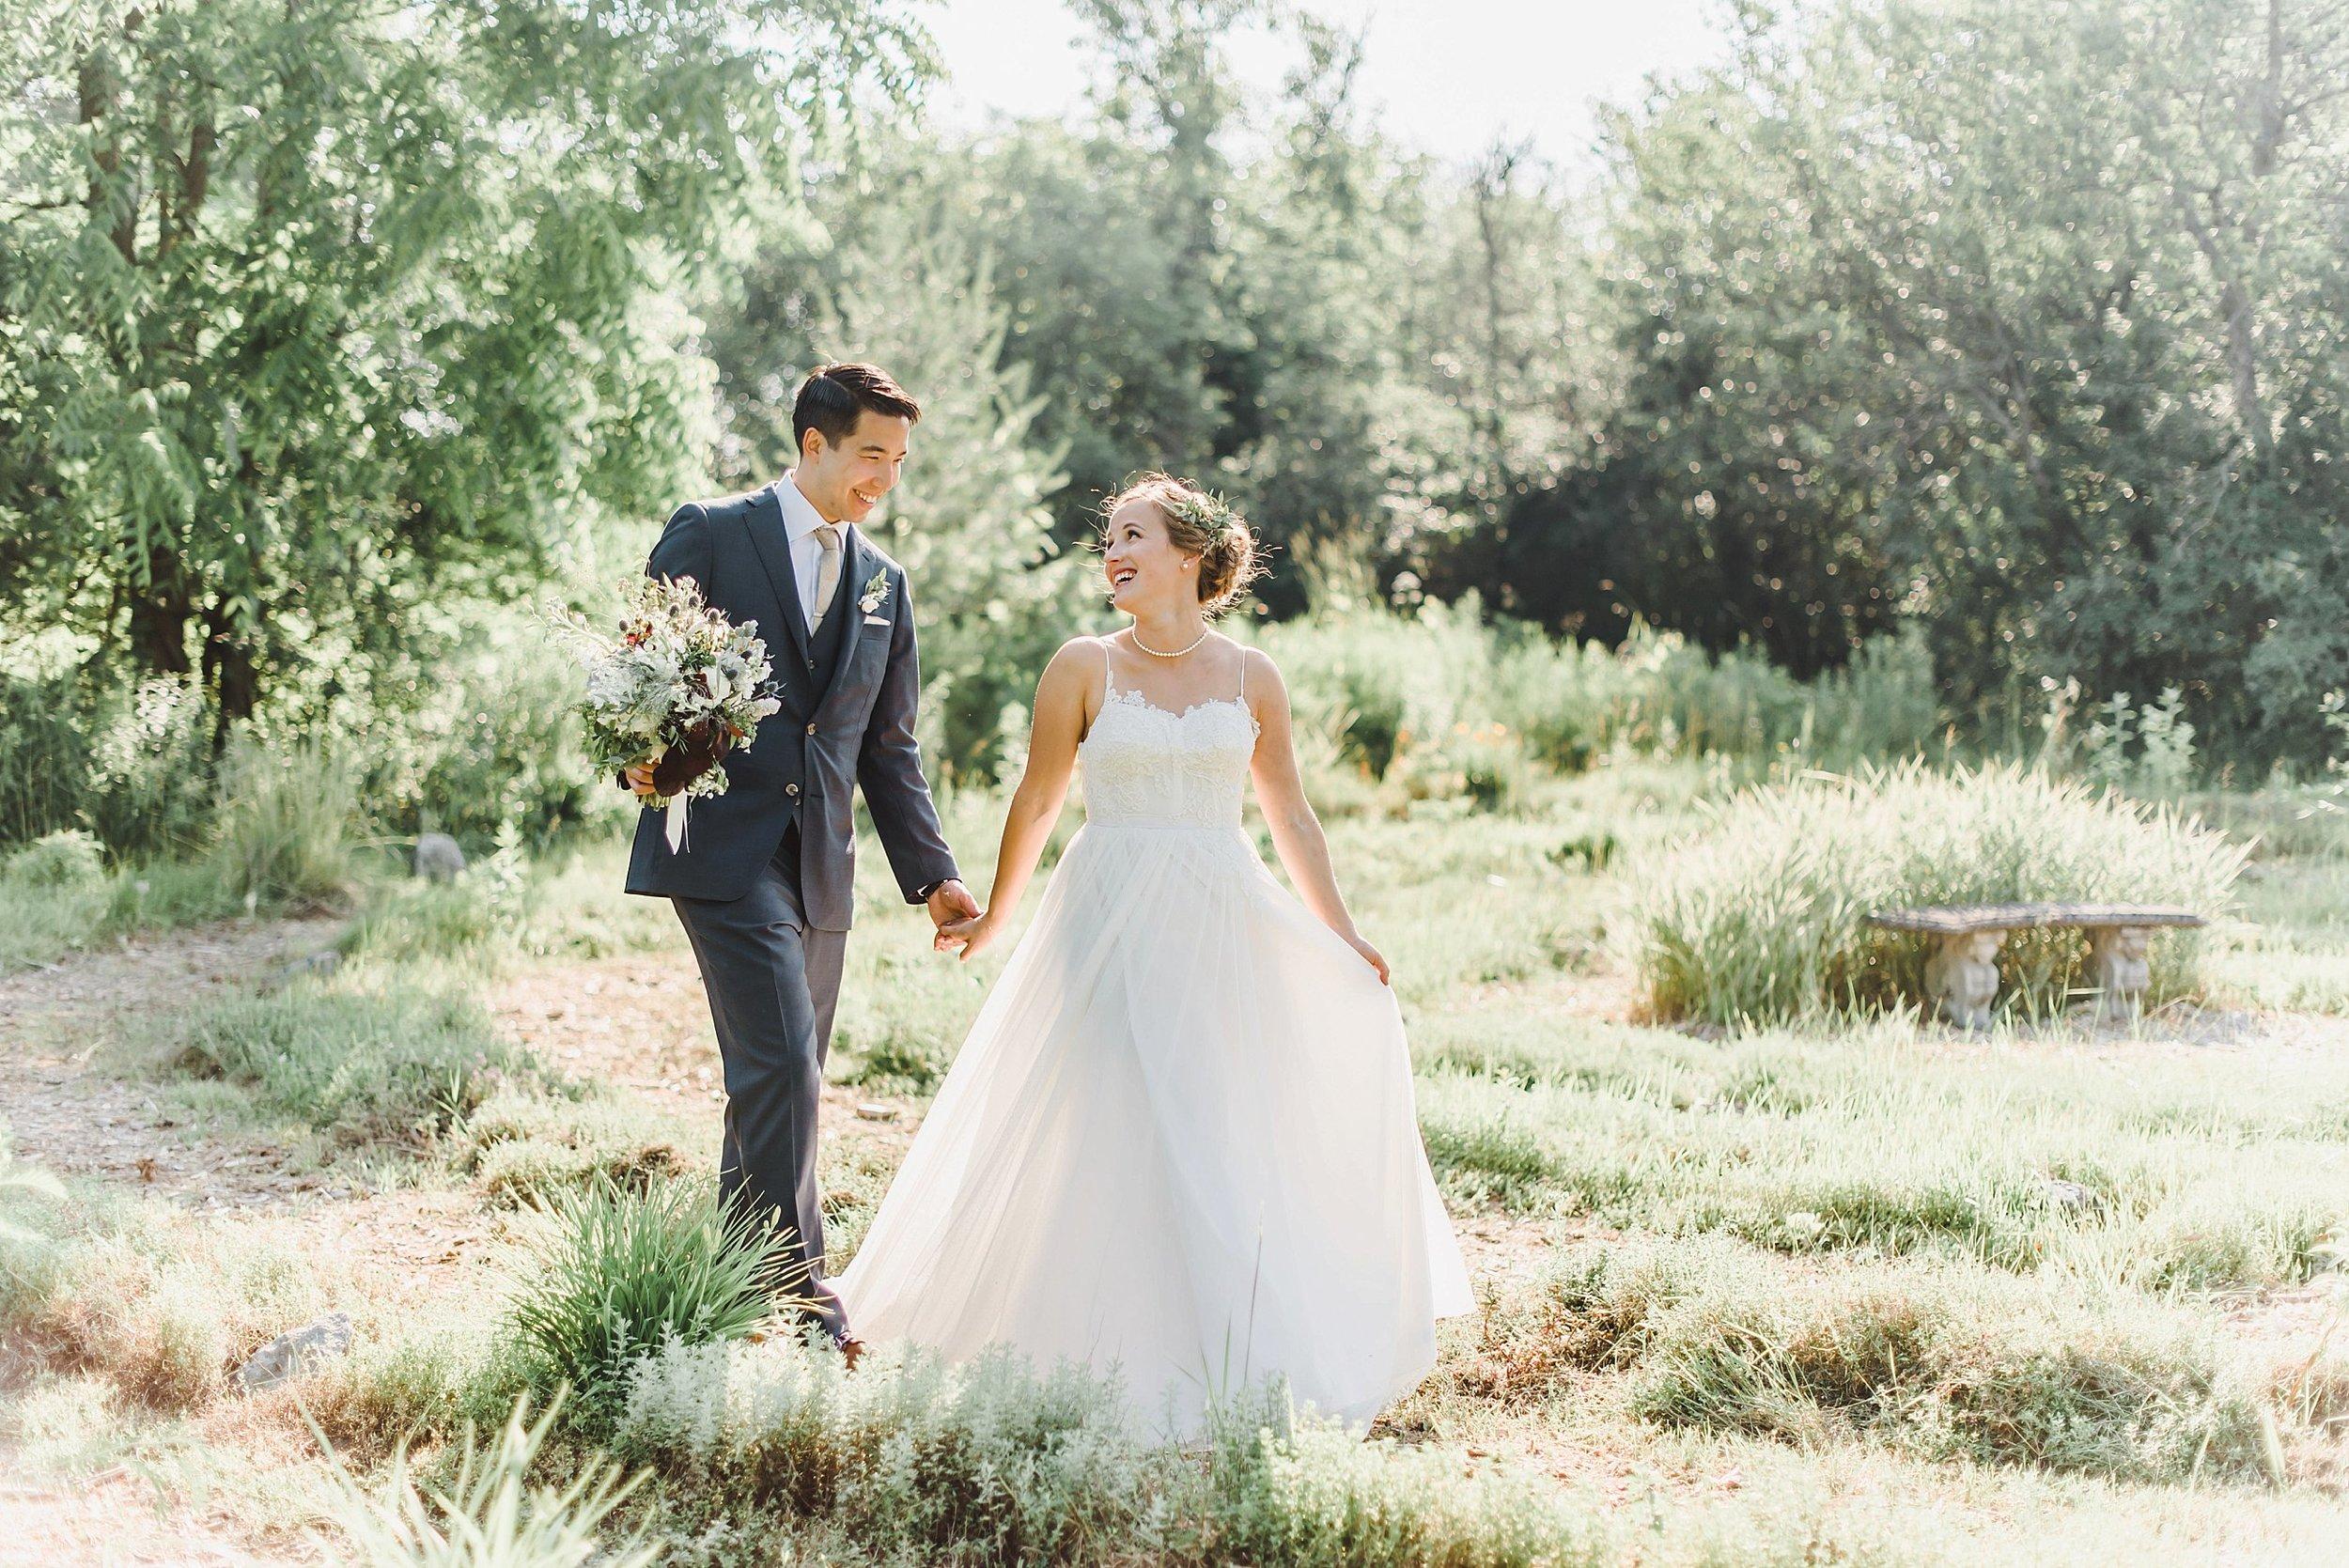 light airy indie fine art ottawa wedding photographer | Ali and Batoul Photography_0844.jpg